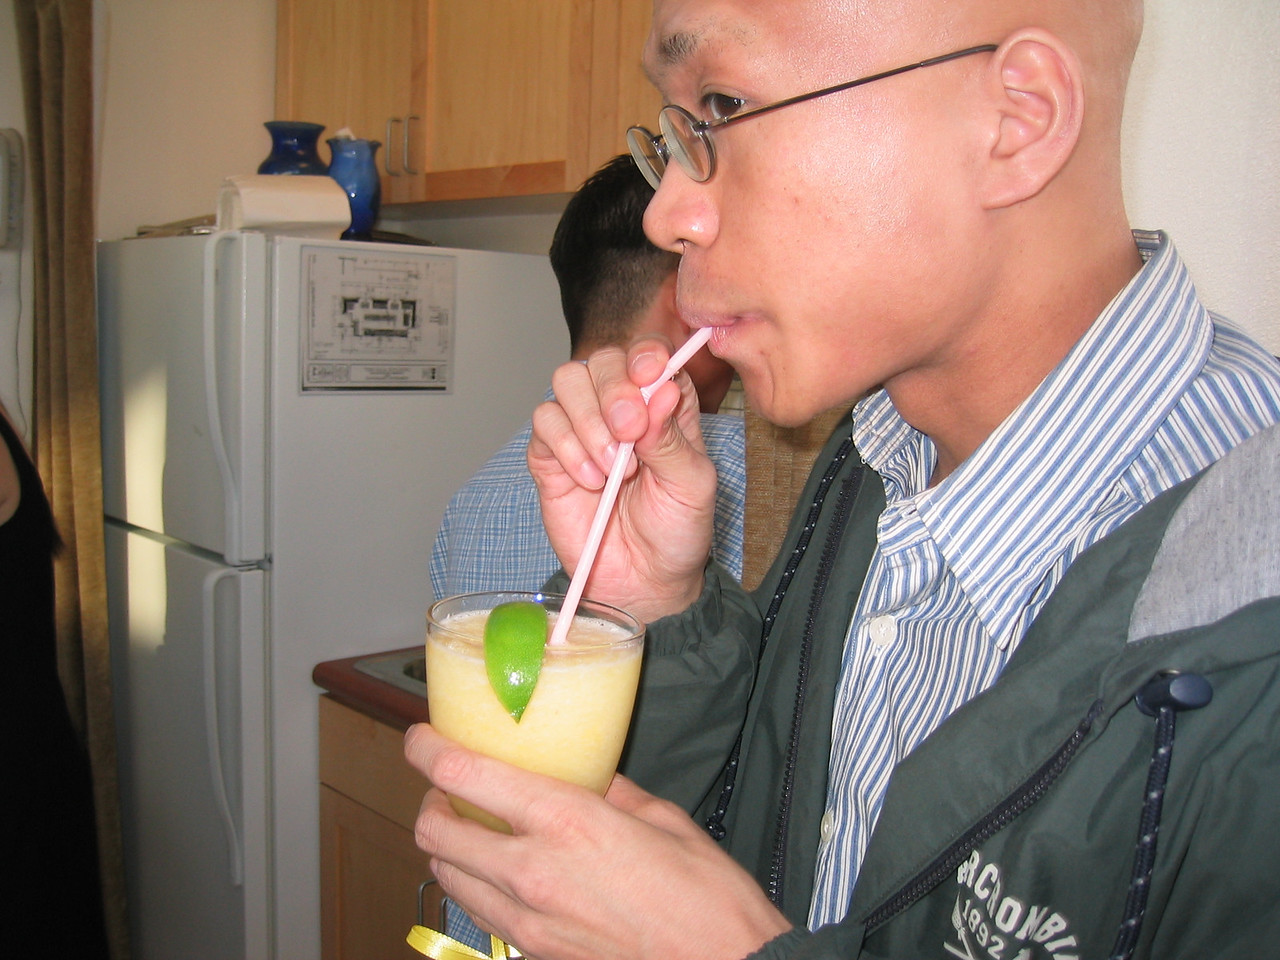 Gilbert daintily sips Eileen & Sam's non-alcoholic brew